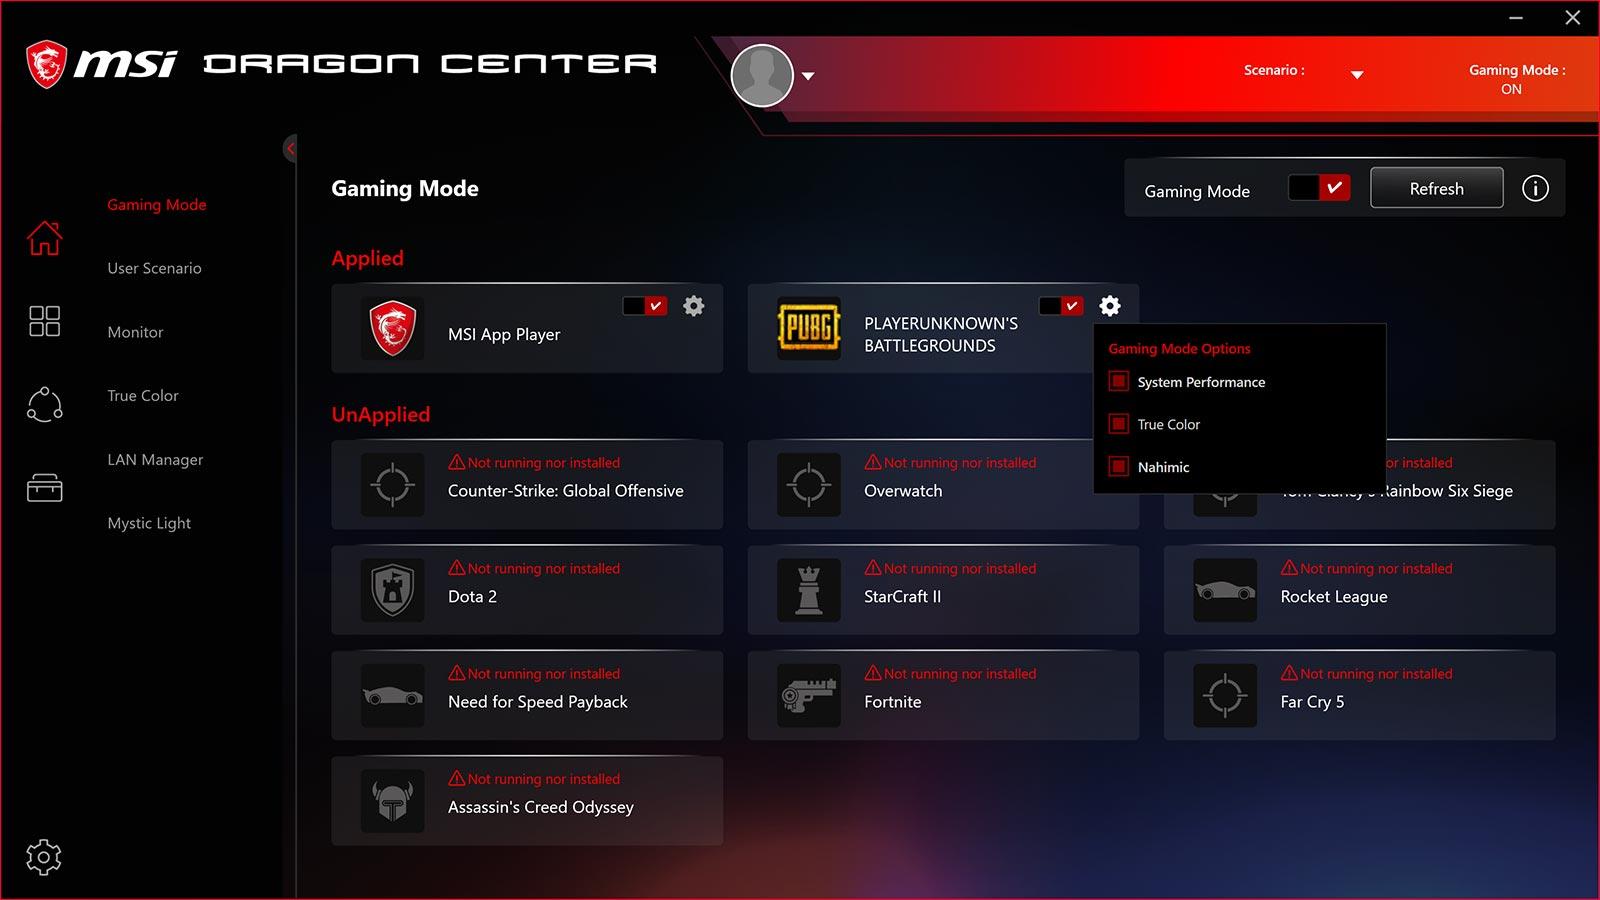 msi dragon center software